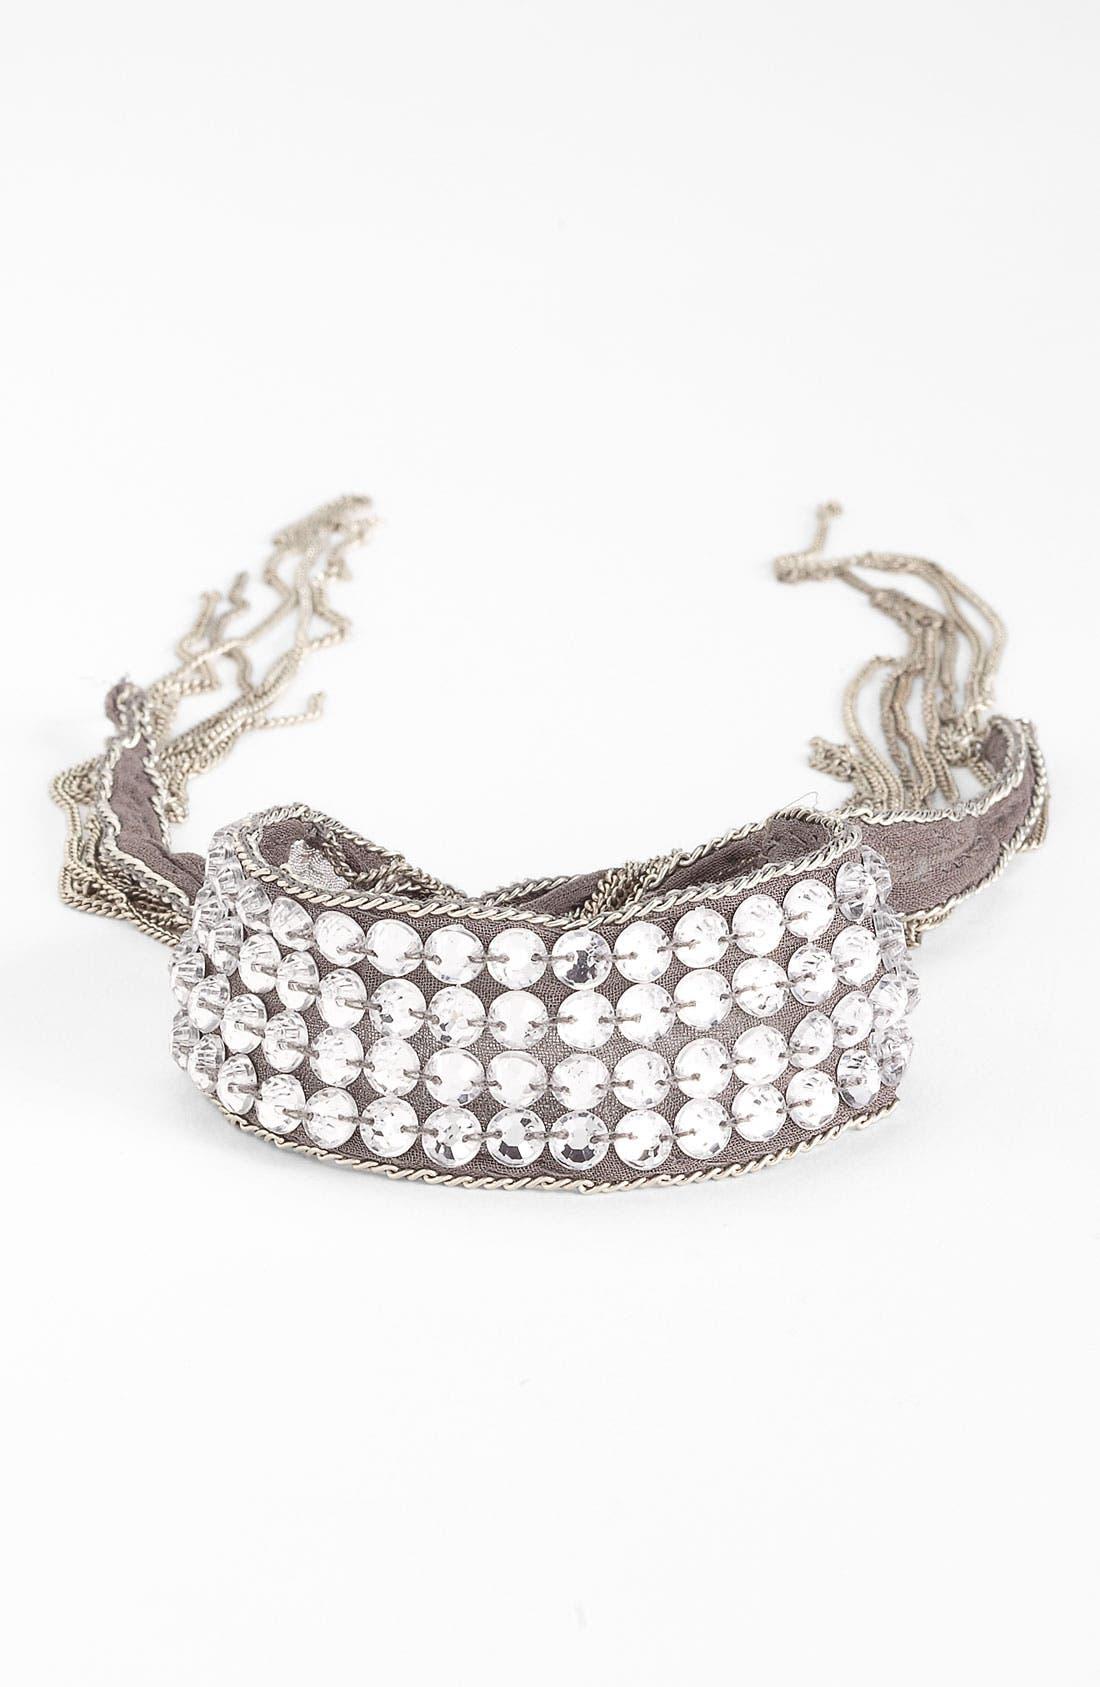 Main Image - Chan Luu Chiffon Tie Bracelet